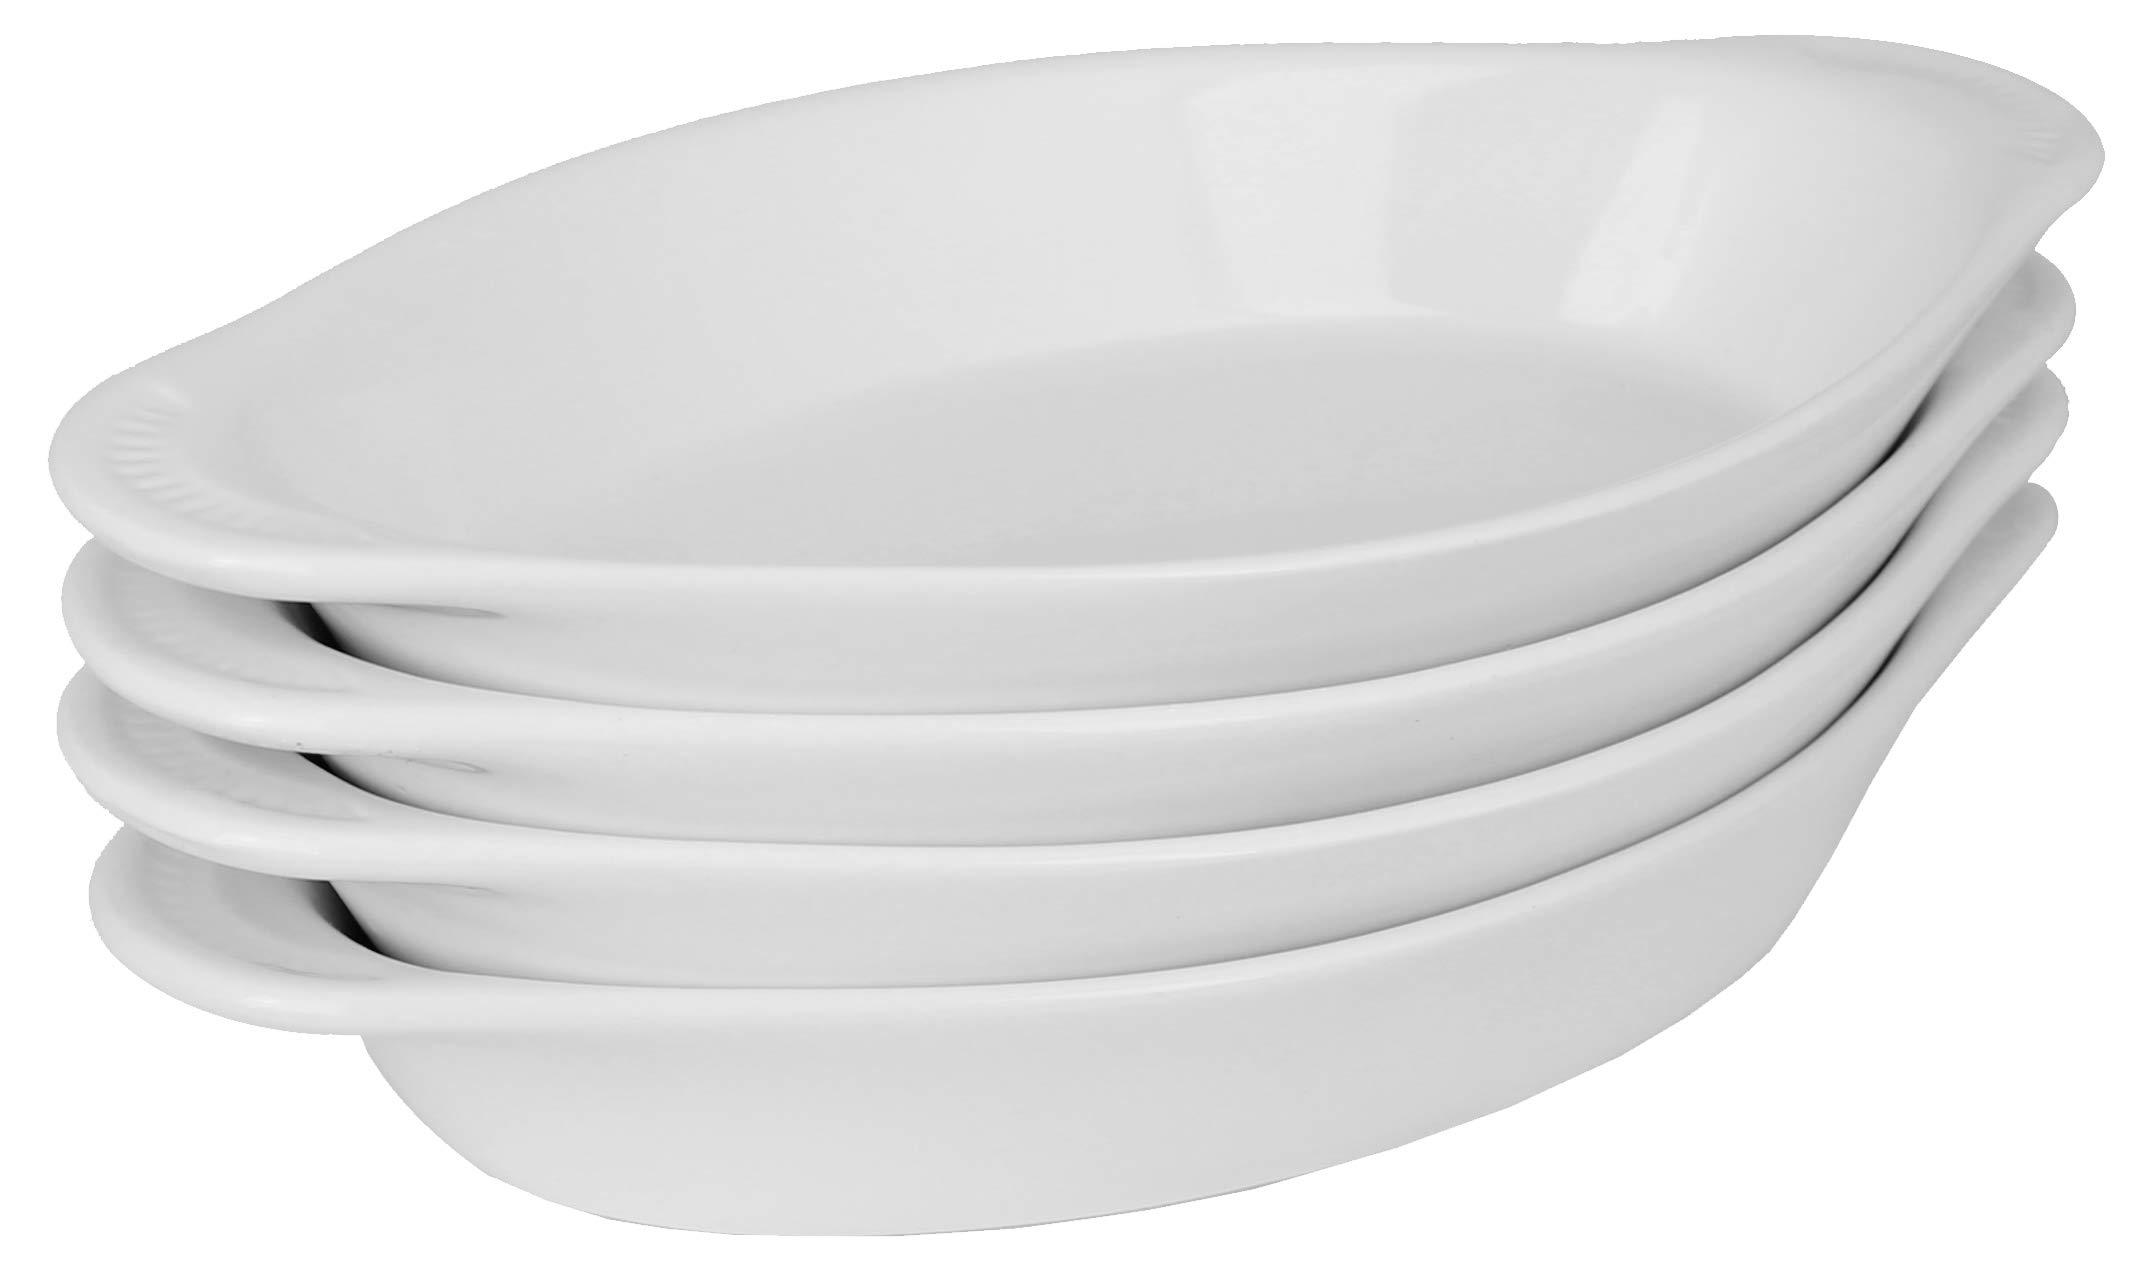 MinWill Brands Ceramic Oval Rarebit/Au Gratin Baking Dish with Pan Scraper (4-Pack, 12 Ounce, Pure White)